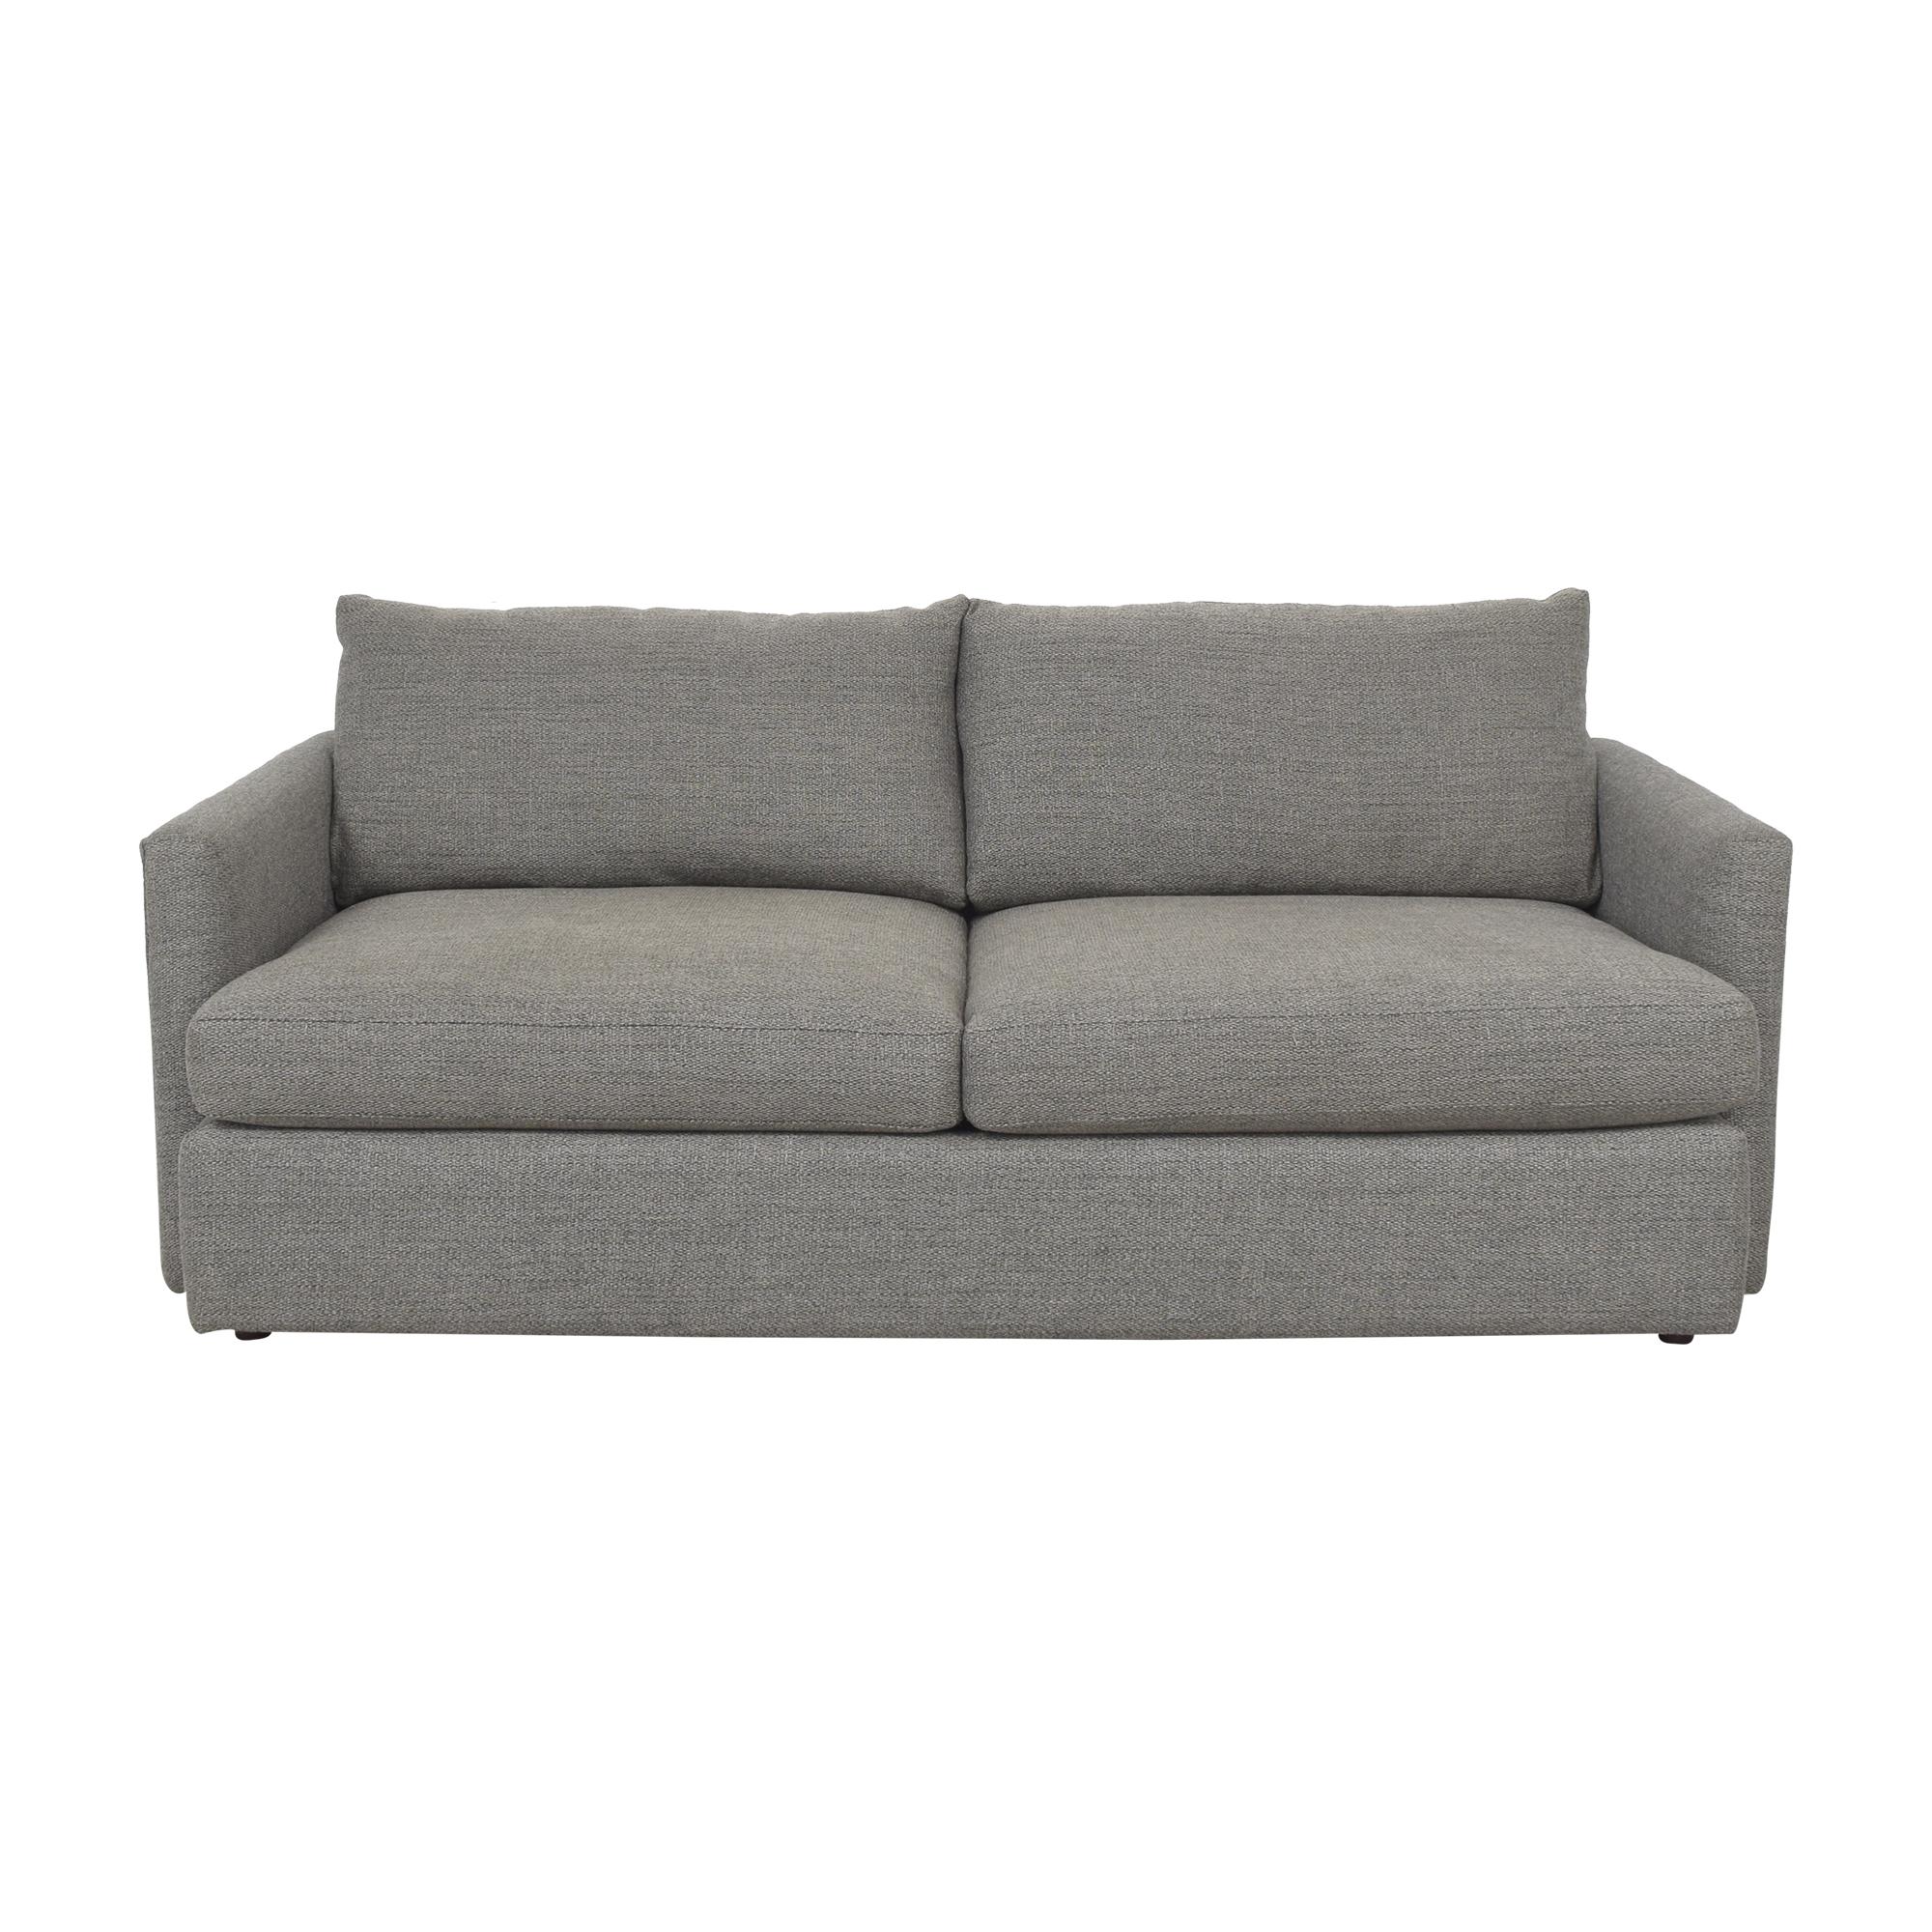 Crate & Barrel Crate & Barrel Lounge II Modern Sofa